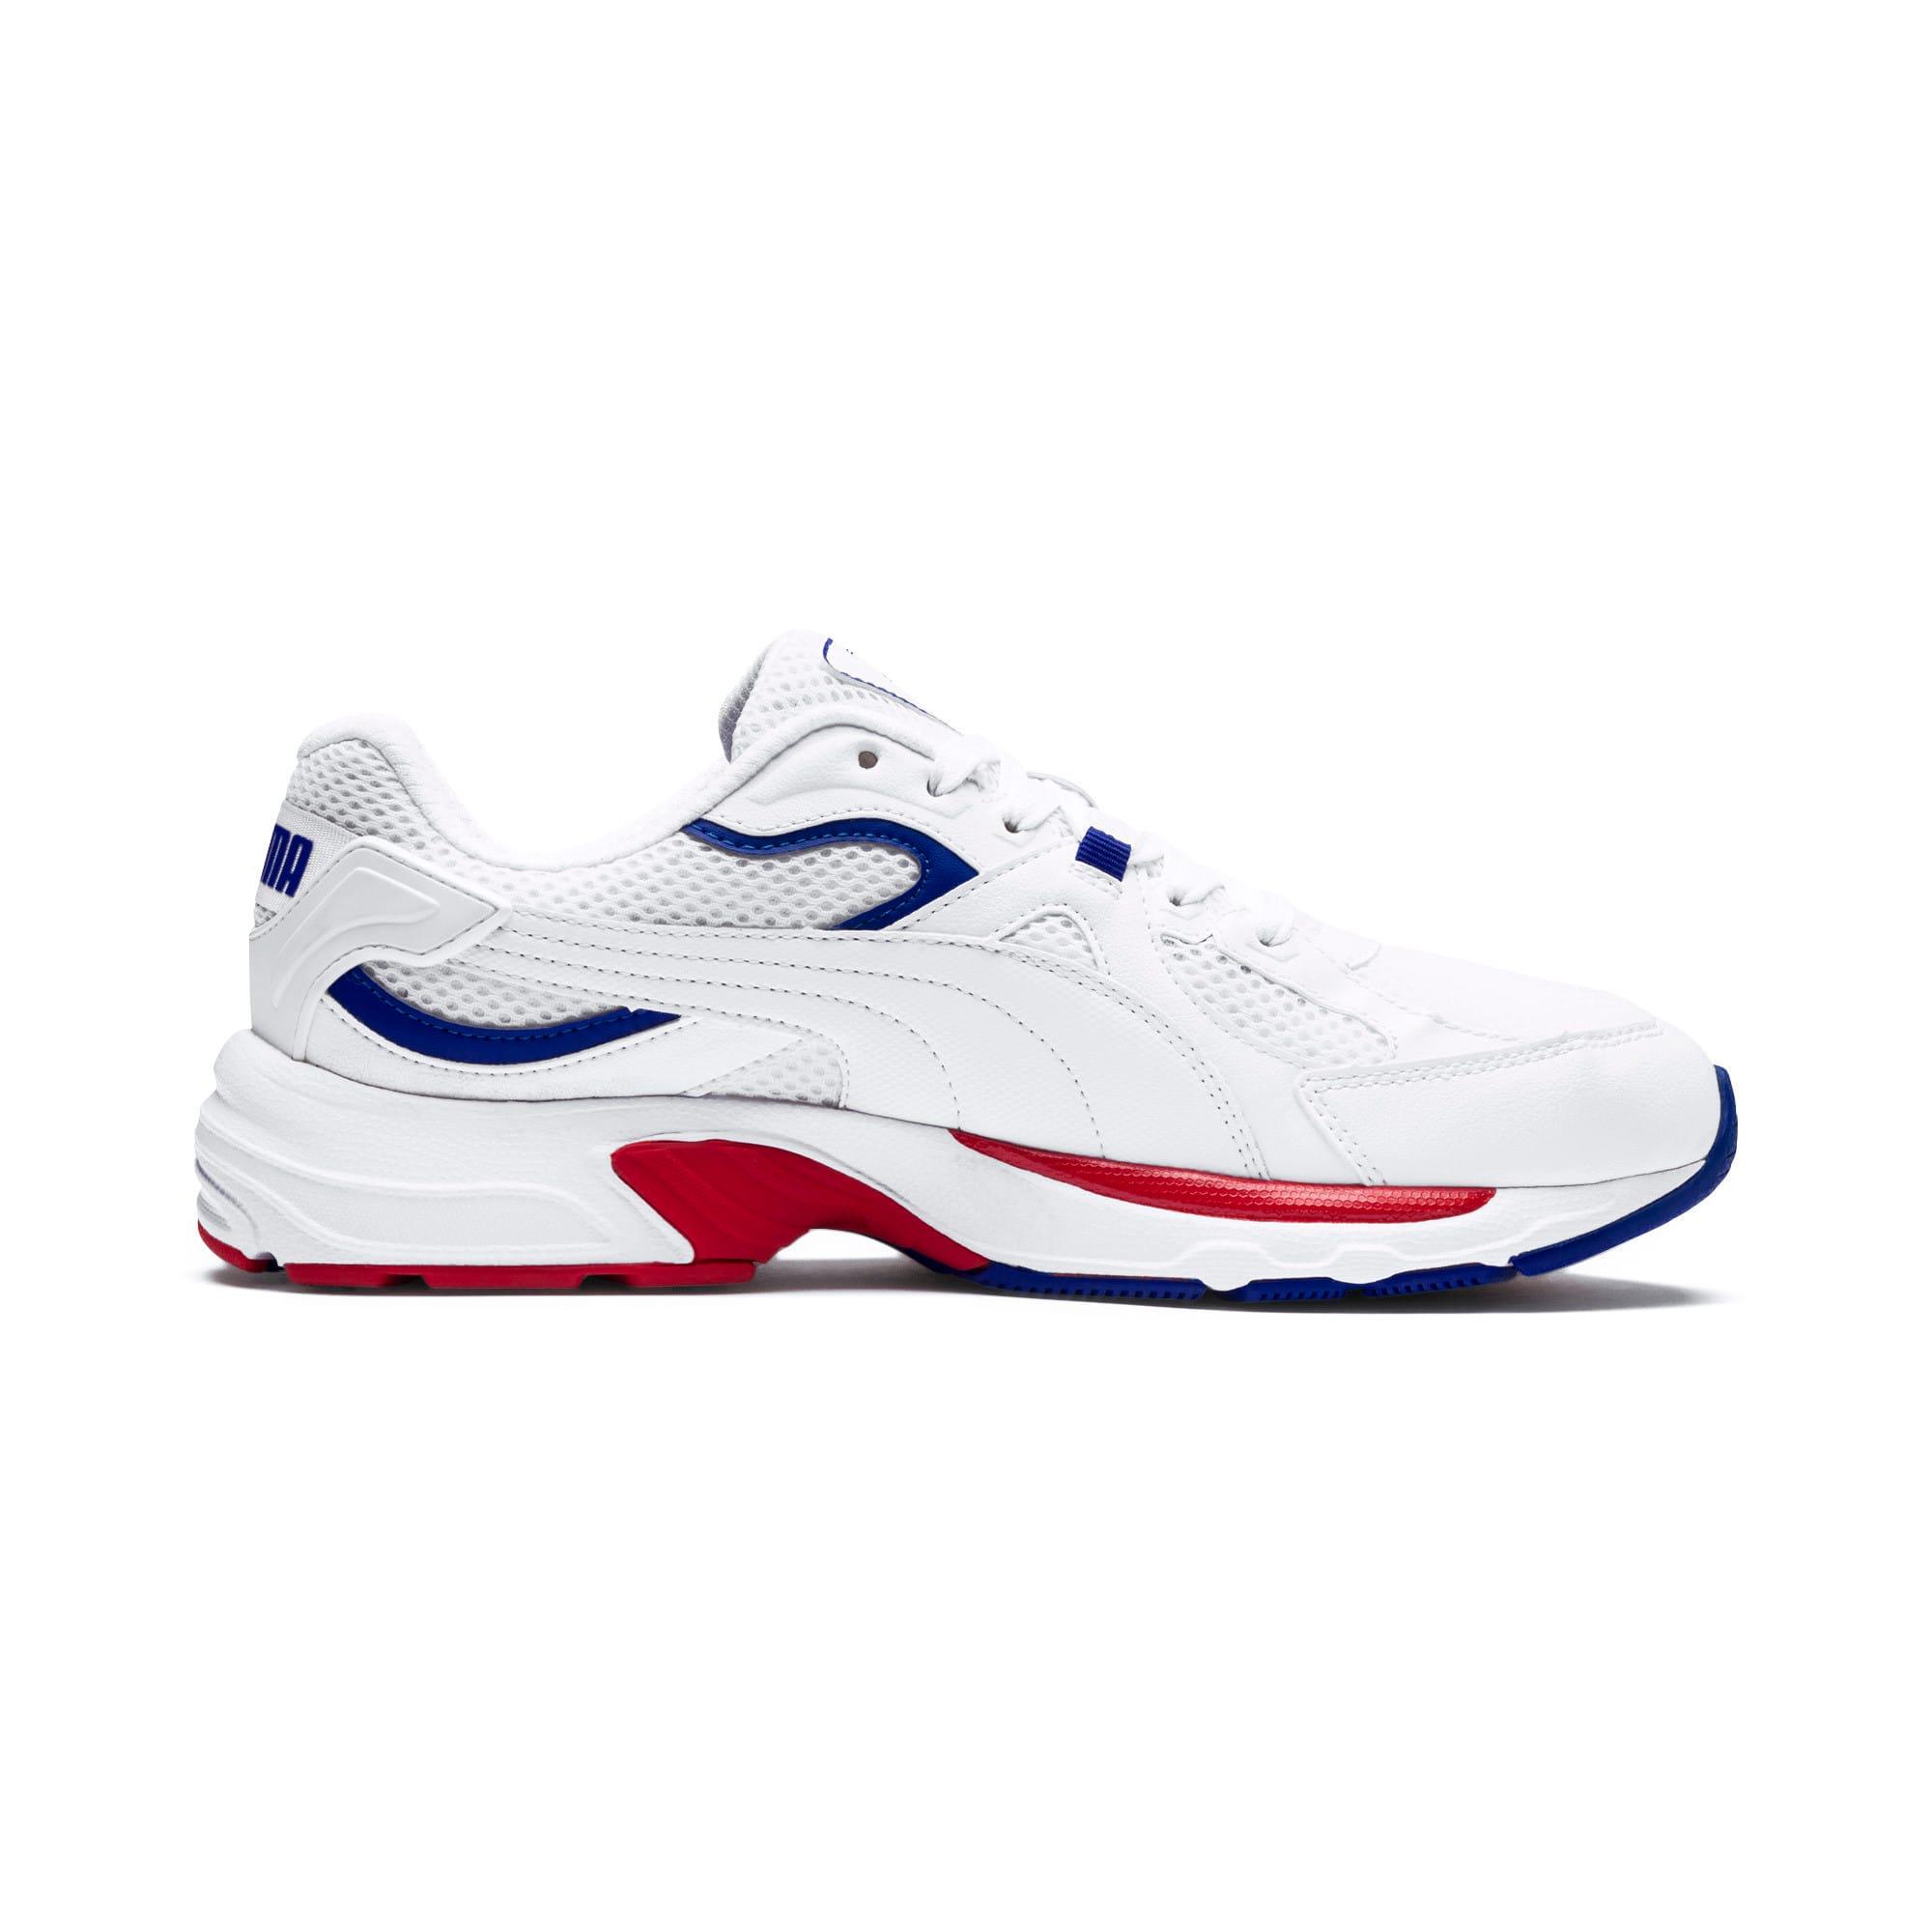 Thumbnail 5 of Axis Plus 90s Sneakers, Puma White-Puma White, medium